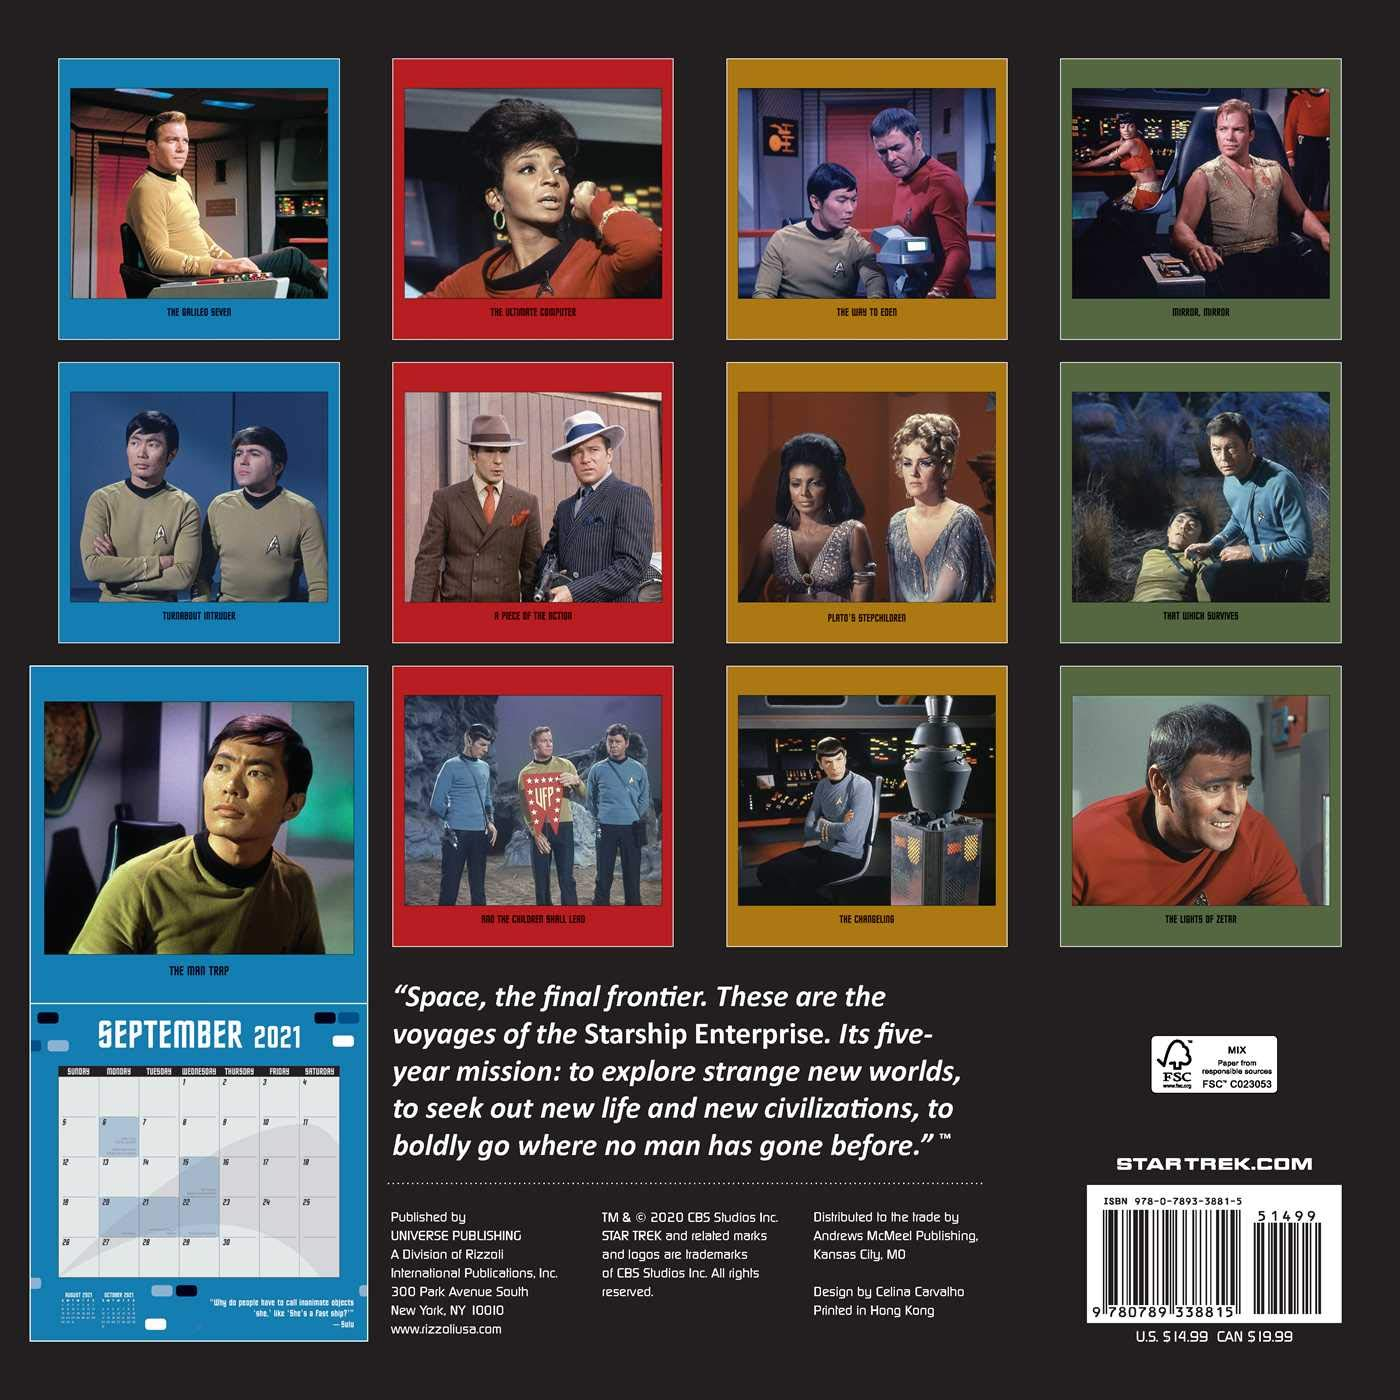 Calendario Star Trek 2021 Star Trek 2021 Wall Calendar: The Original Series: CBS